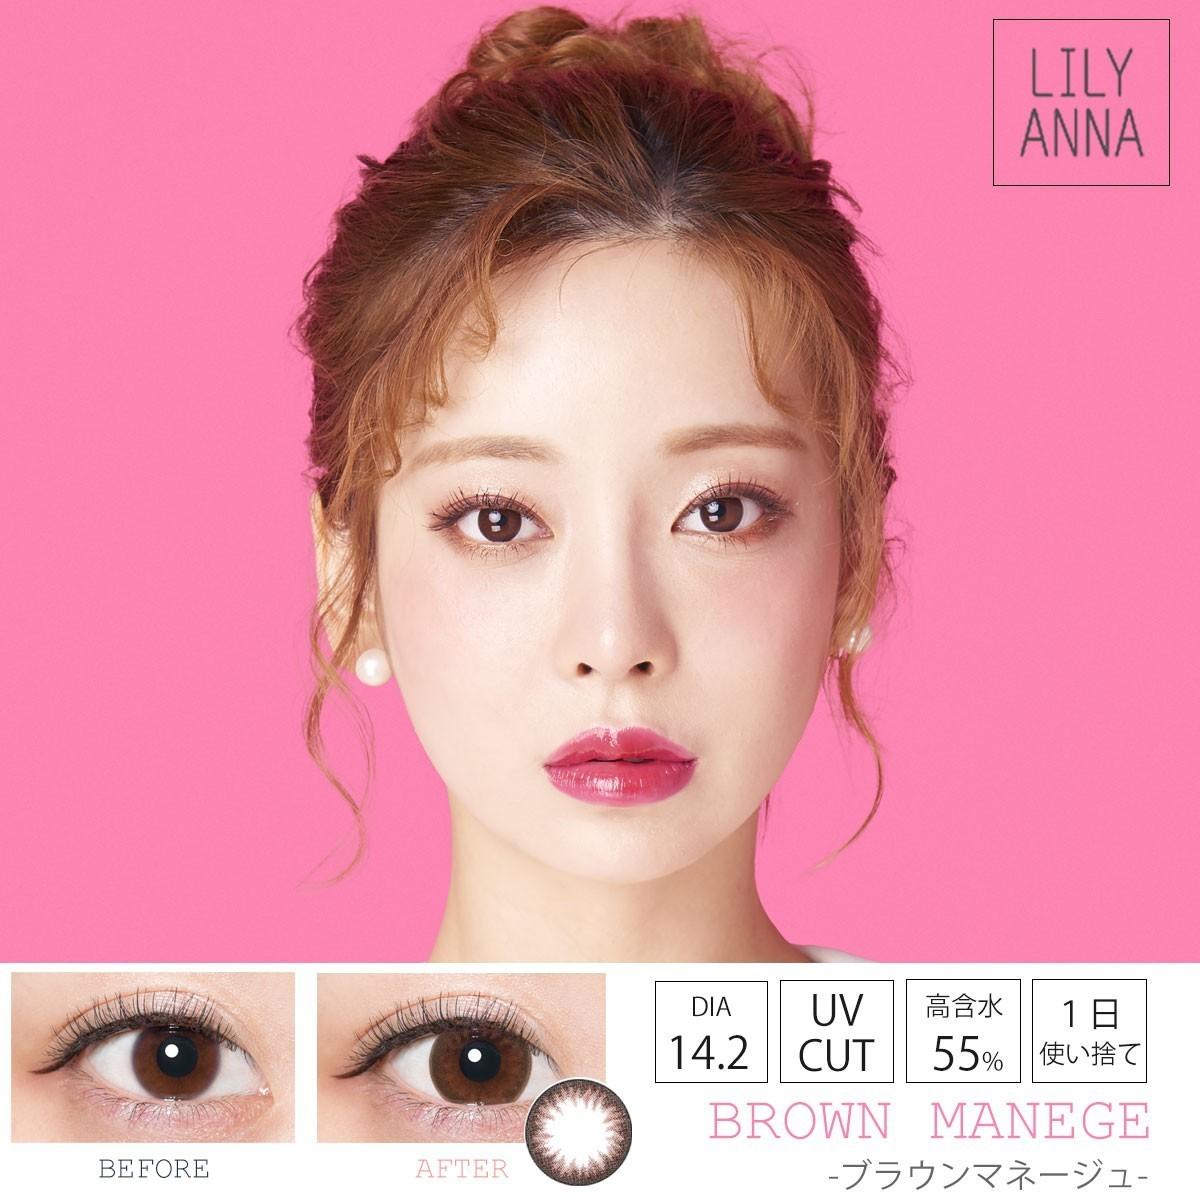 PIA株式会社 LILY ANNA(リリーアンナ) ワンデー カラー各種 10枚入りの商品画像|3